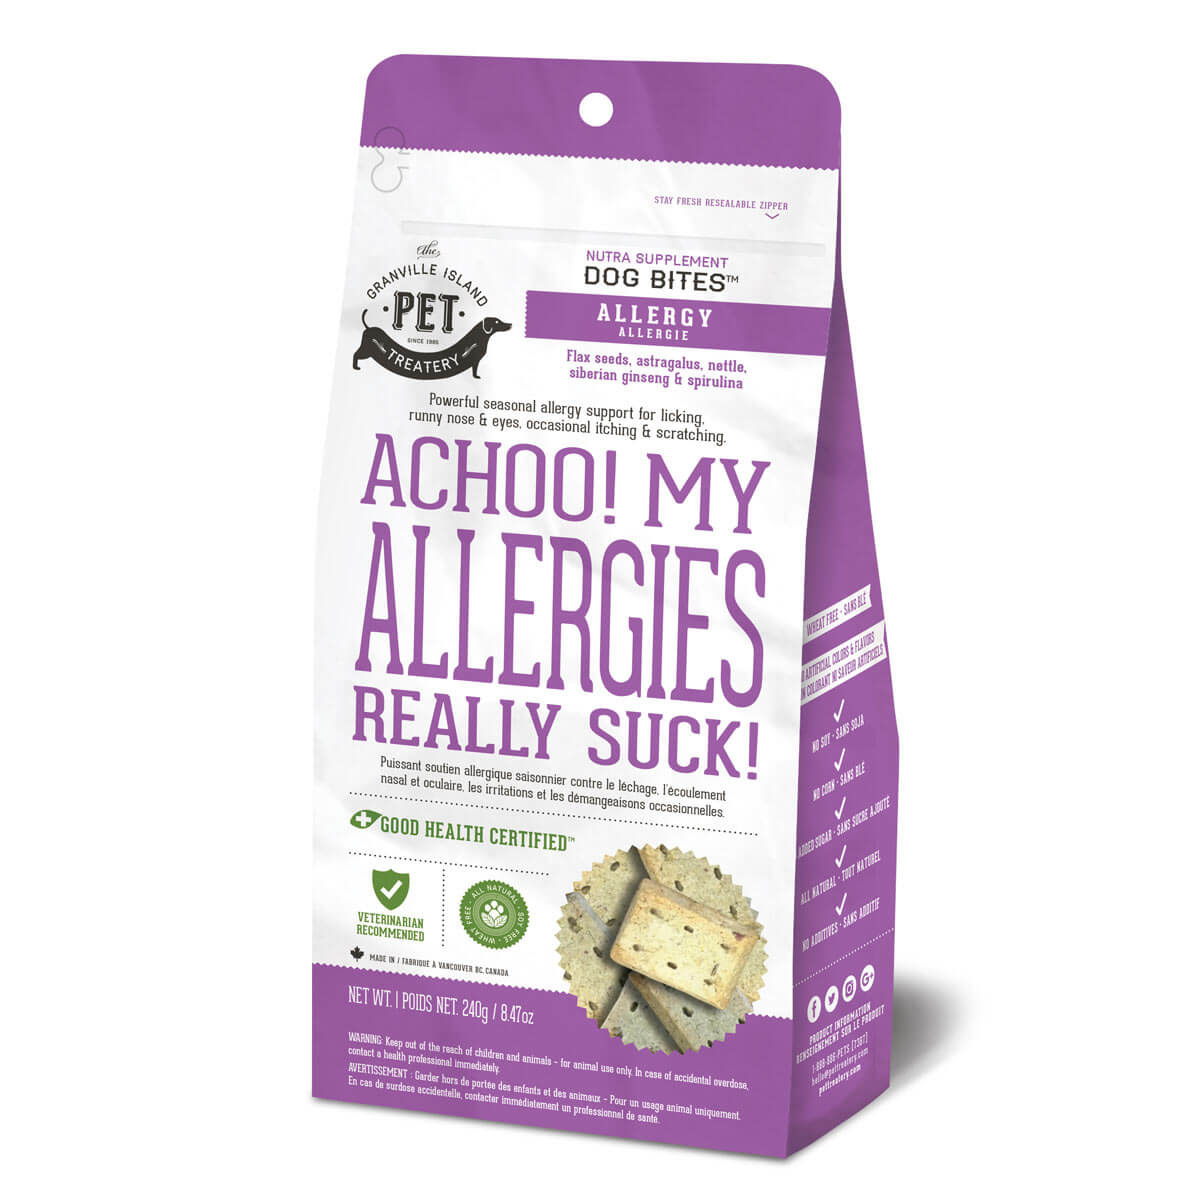 Granville Island Nutra Bite for Allergy 8.47 oz